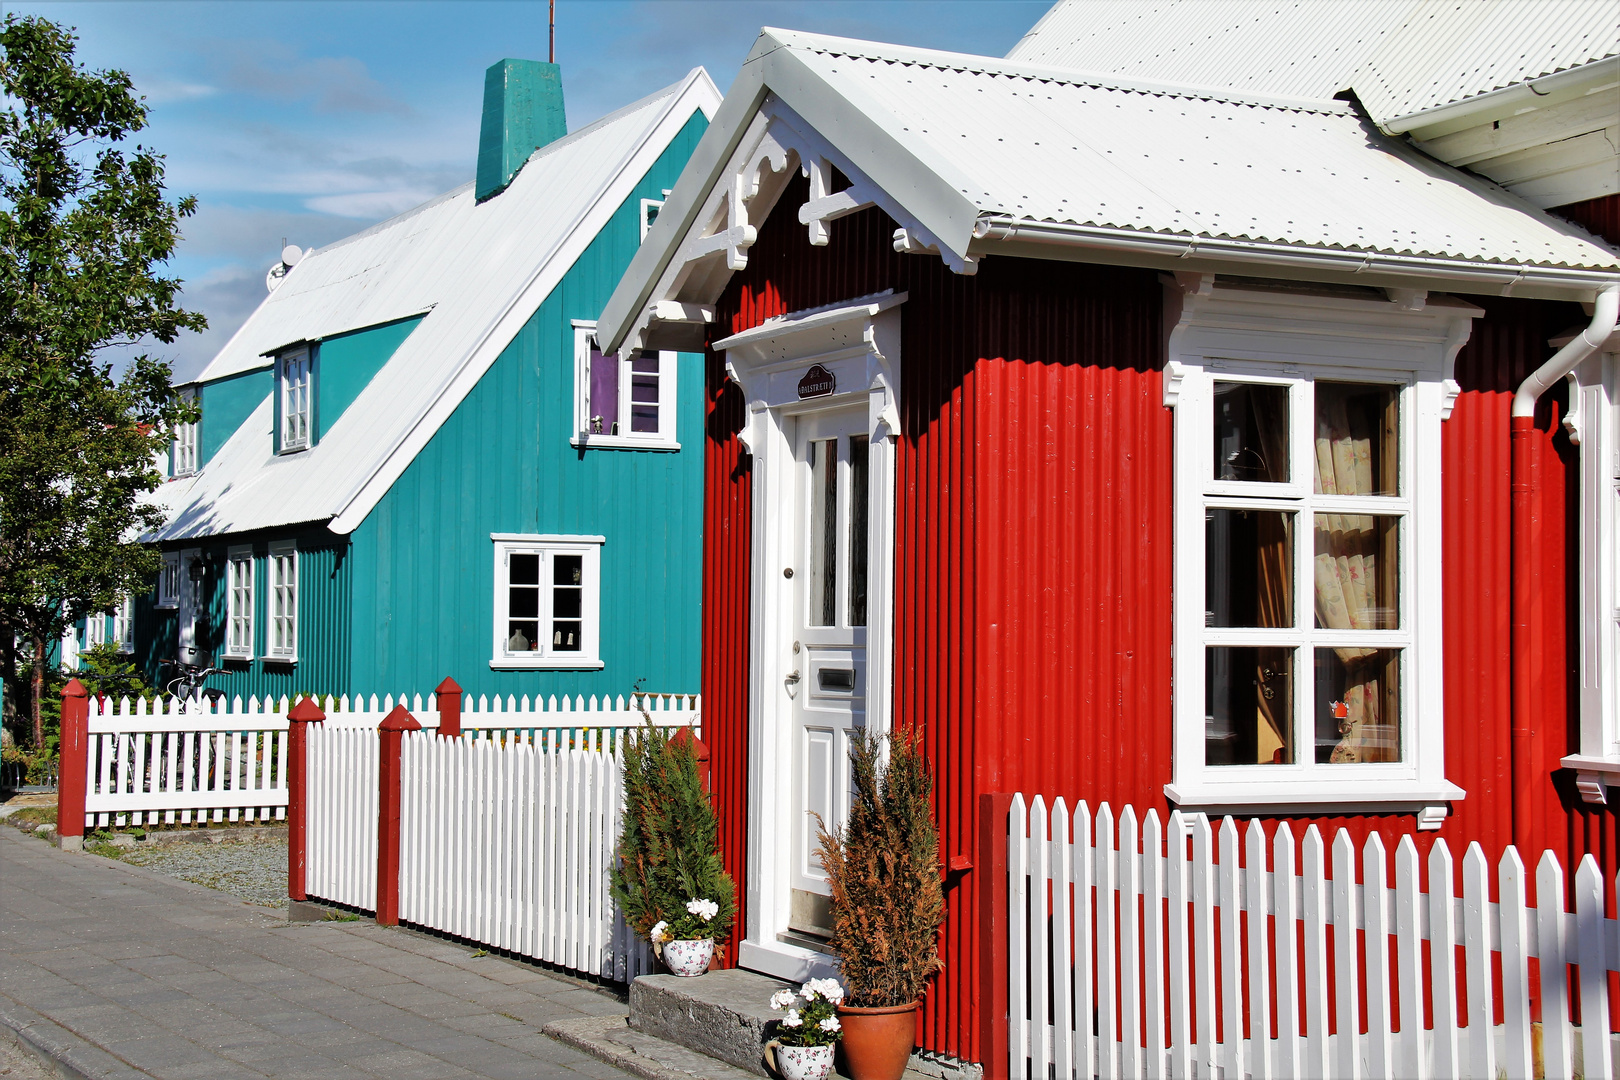 Farbige Wellblechhäuser in Isafjördur